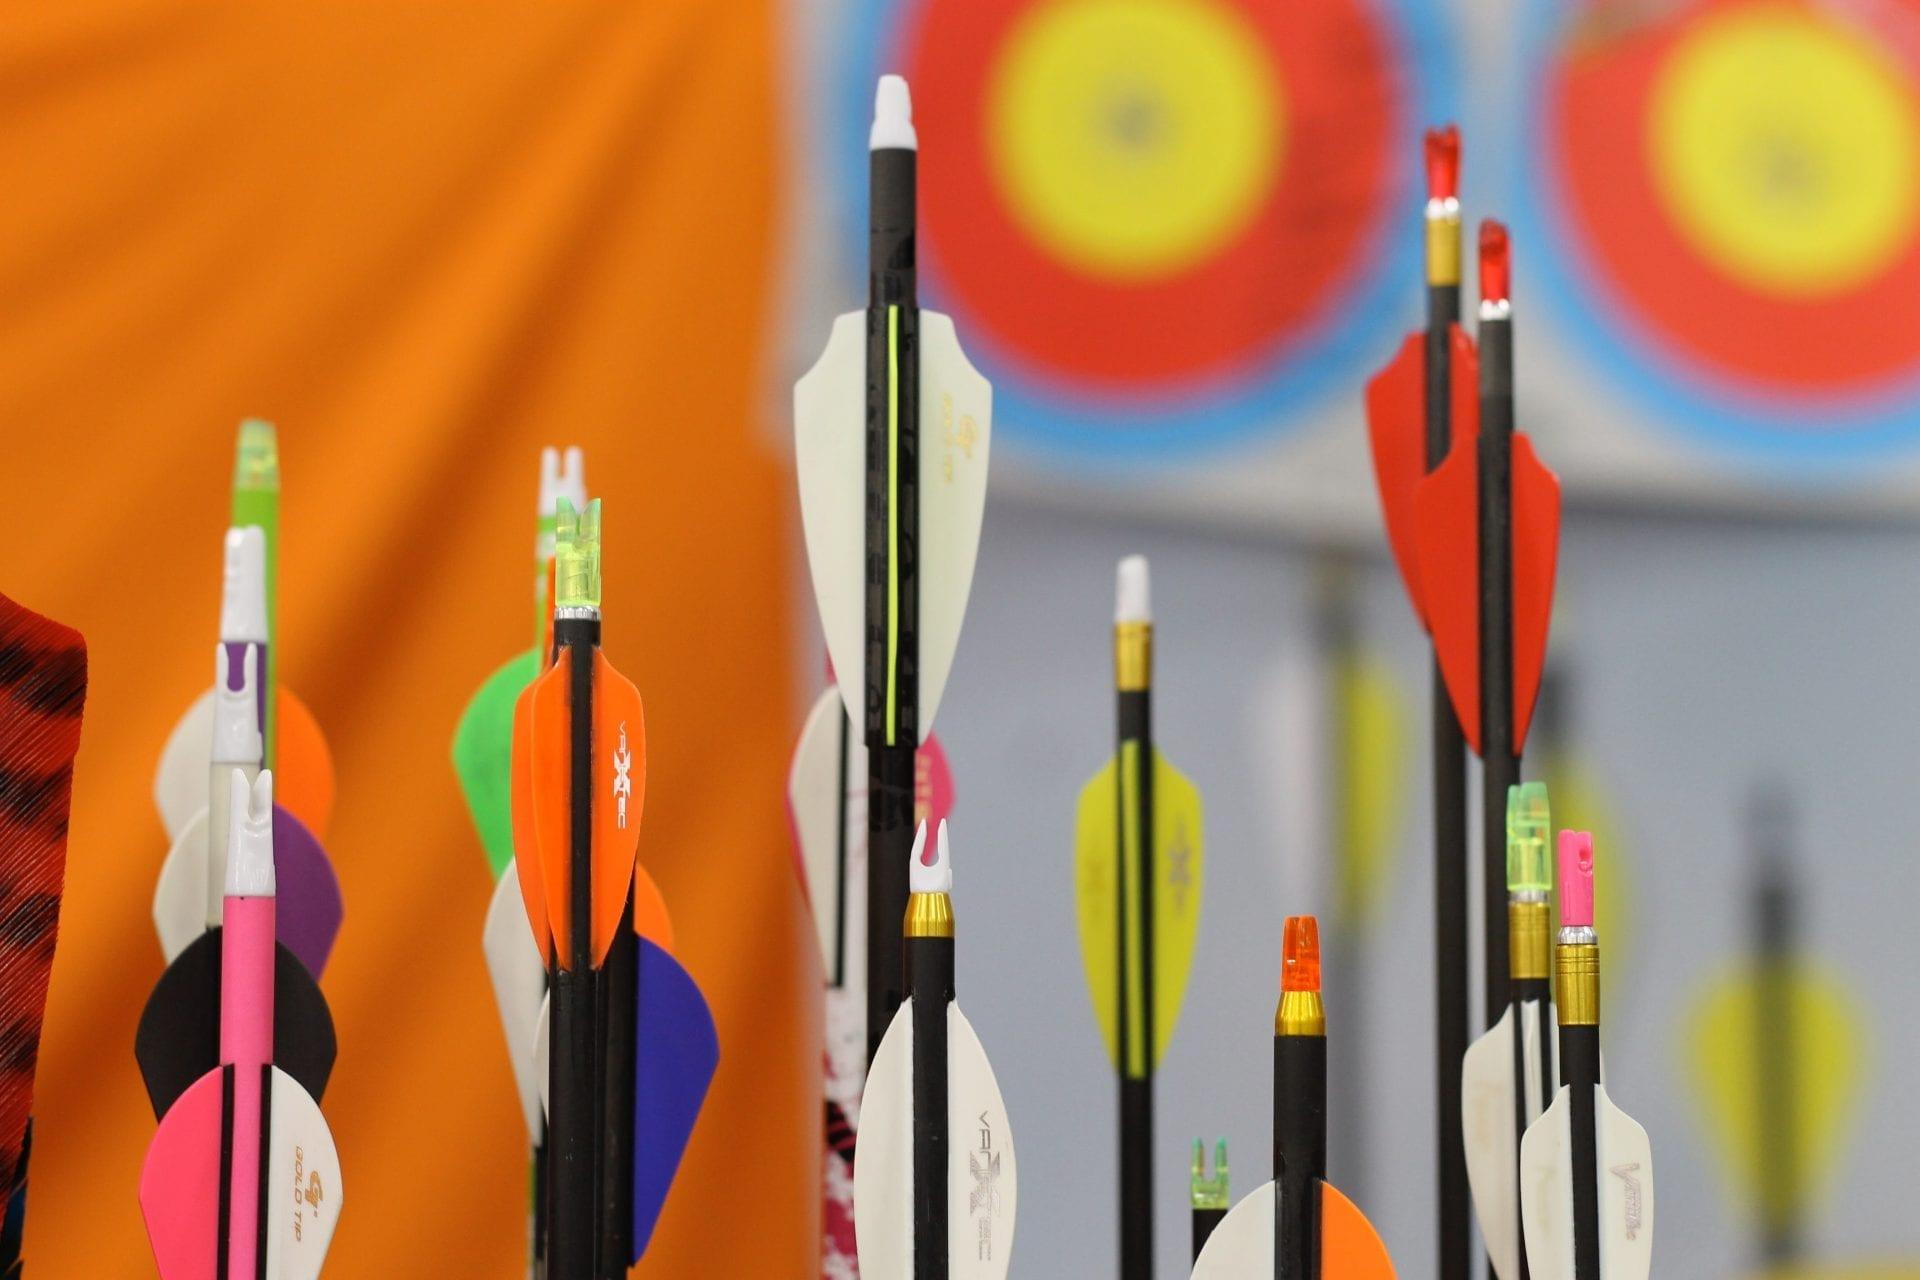 YoungHakJeong (Mokdong) Archery Club